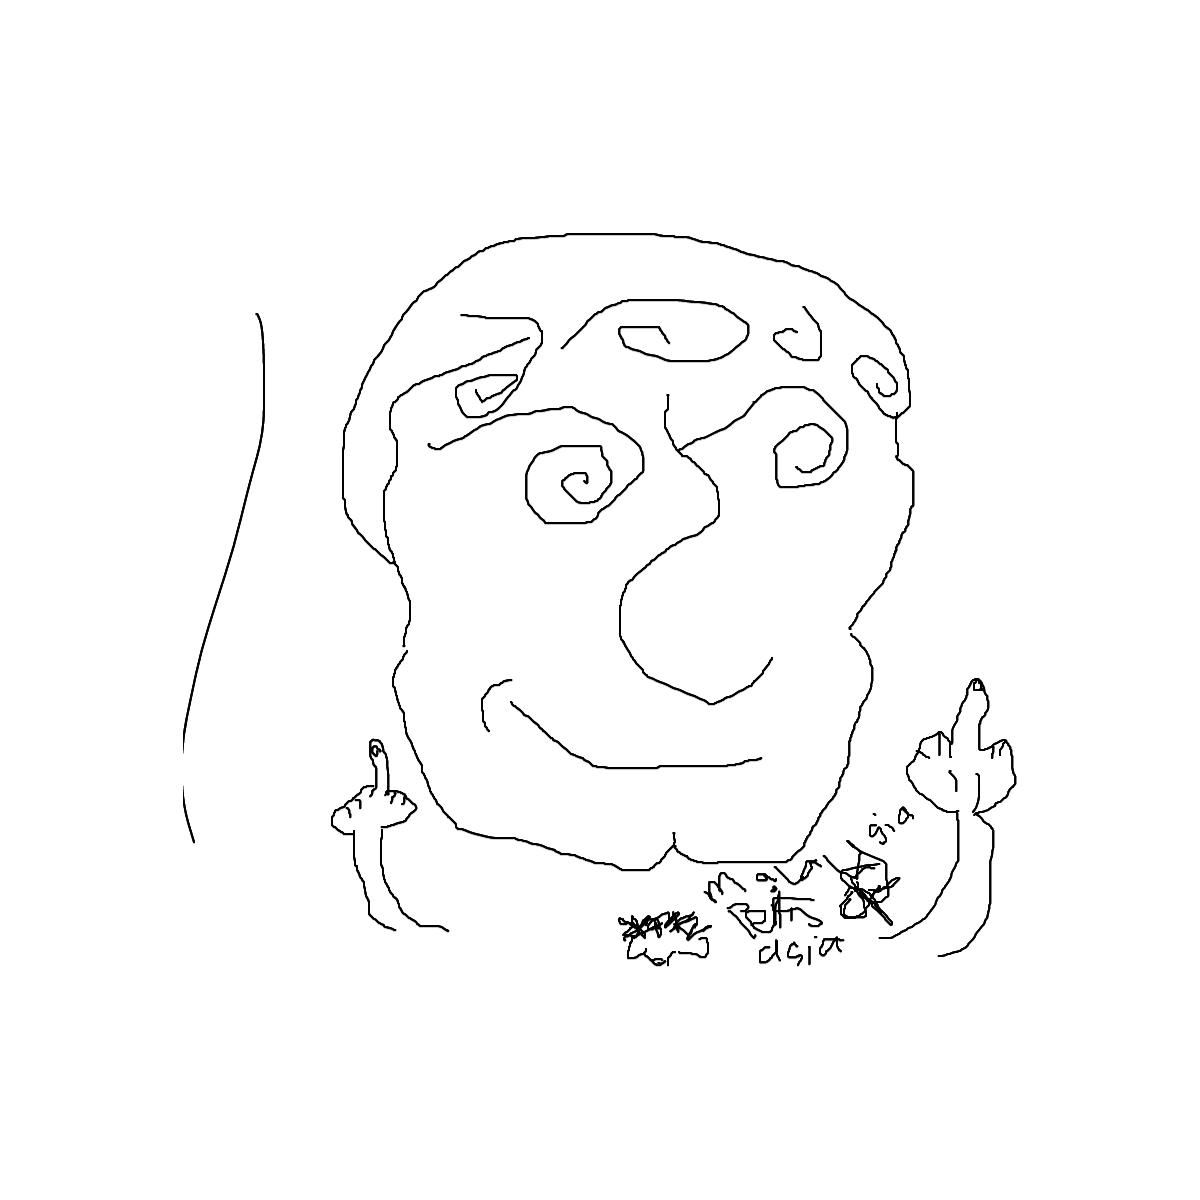 BAAAM drawing#7716 lat:3.1610219478607178lng: 101.7200317382812500